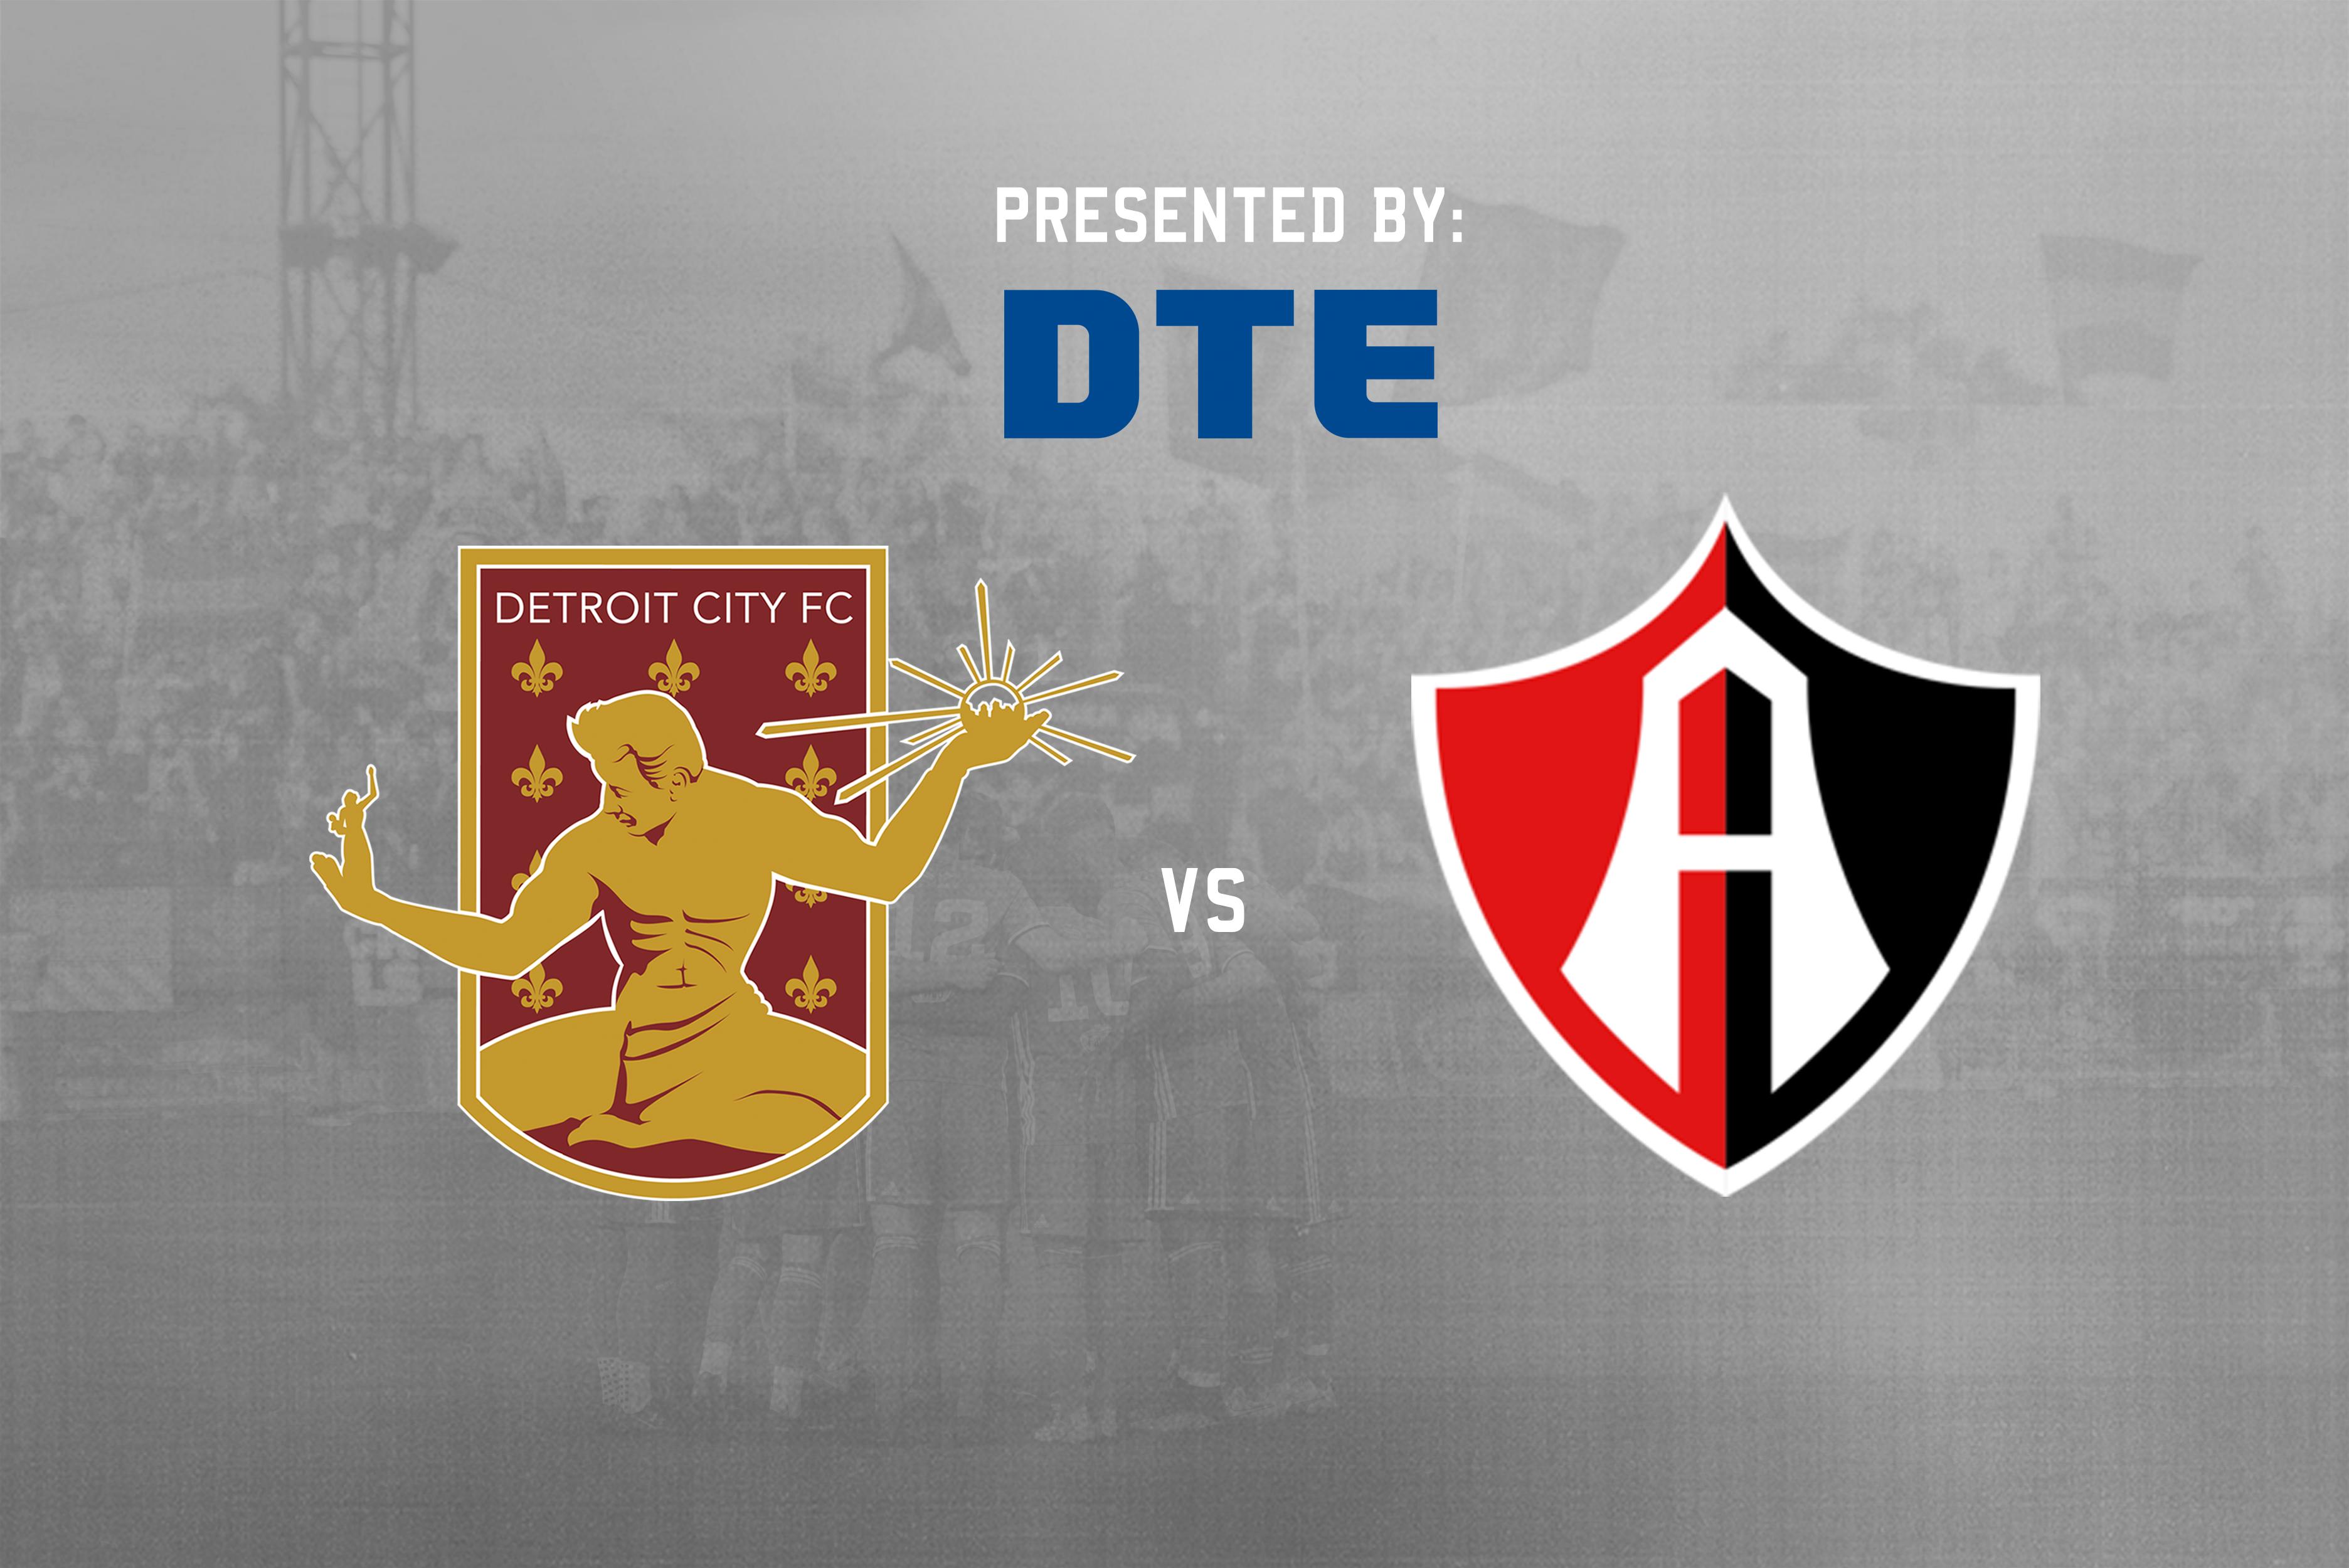 Detroit City FC welcomes Liga MX's Atlas FC on Saturday